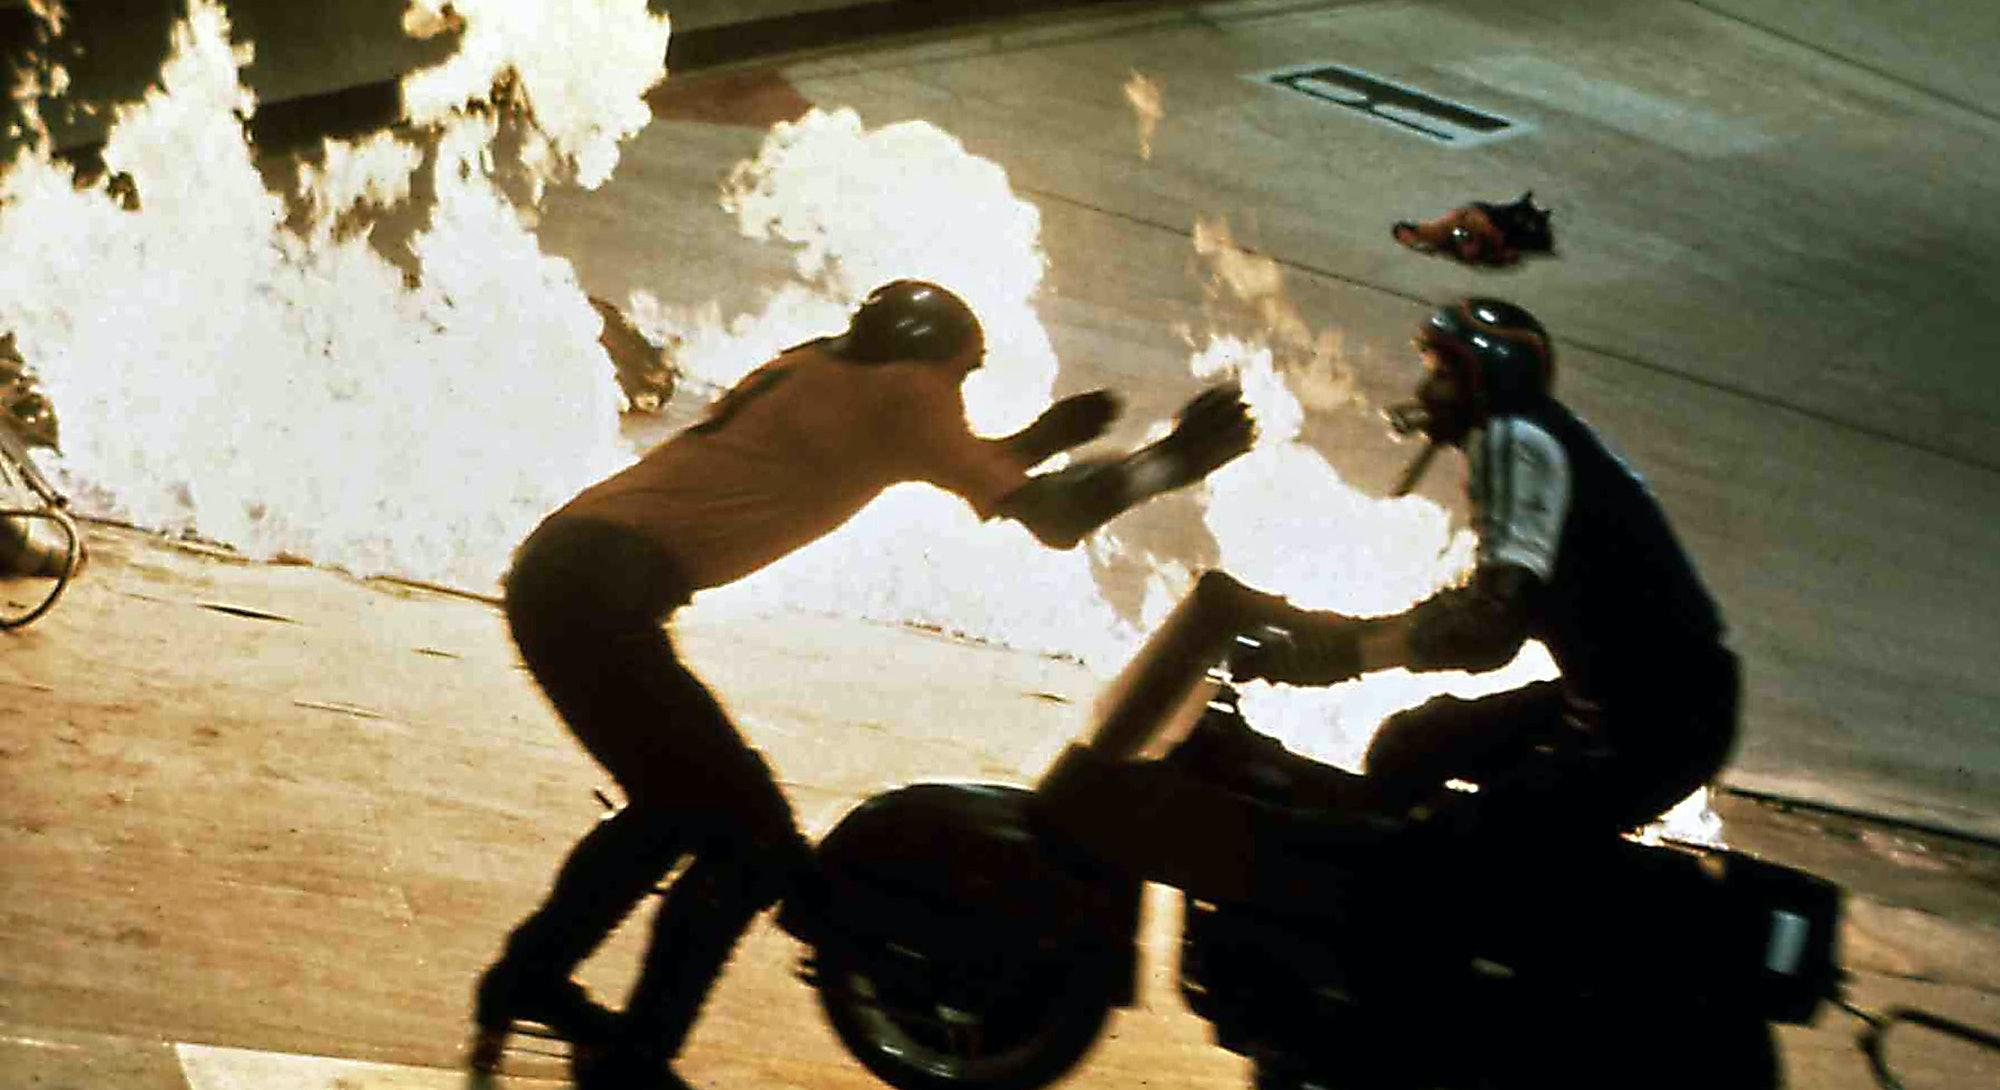 Kino. Rollerball, USA, 1975 Director: Norman Jewison Actors/Stars: James Caan, John Houseman, Maud A...